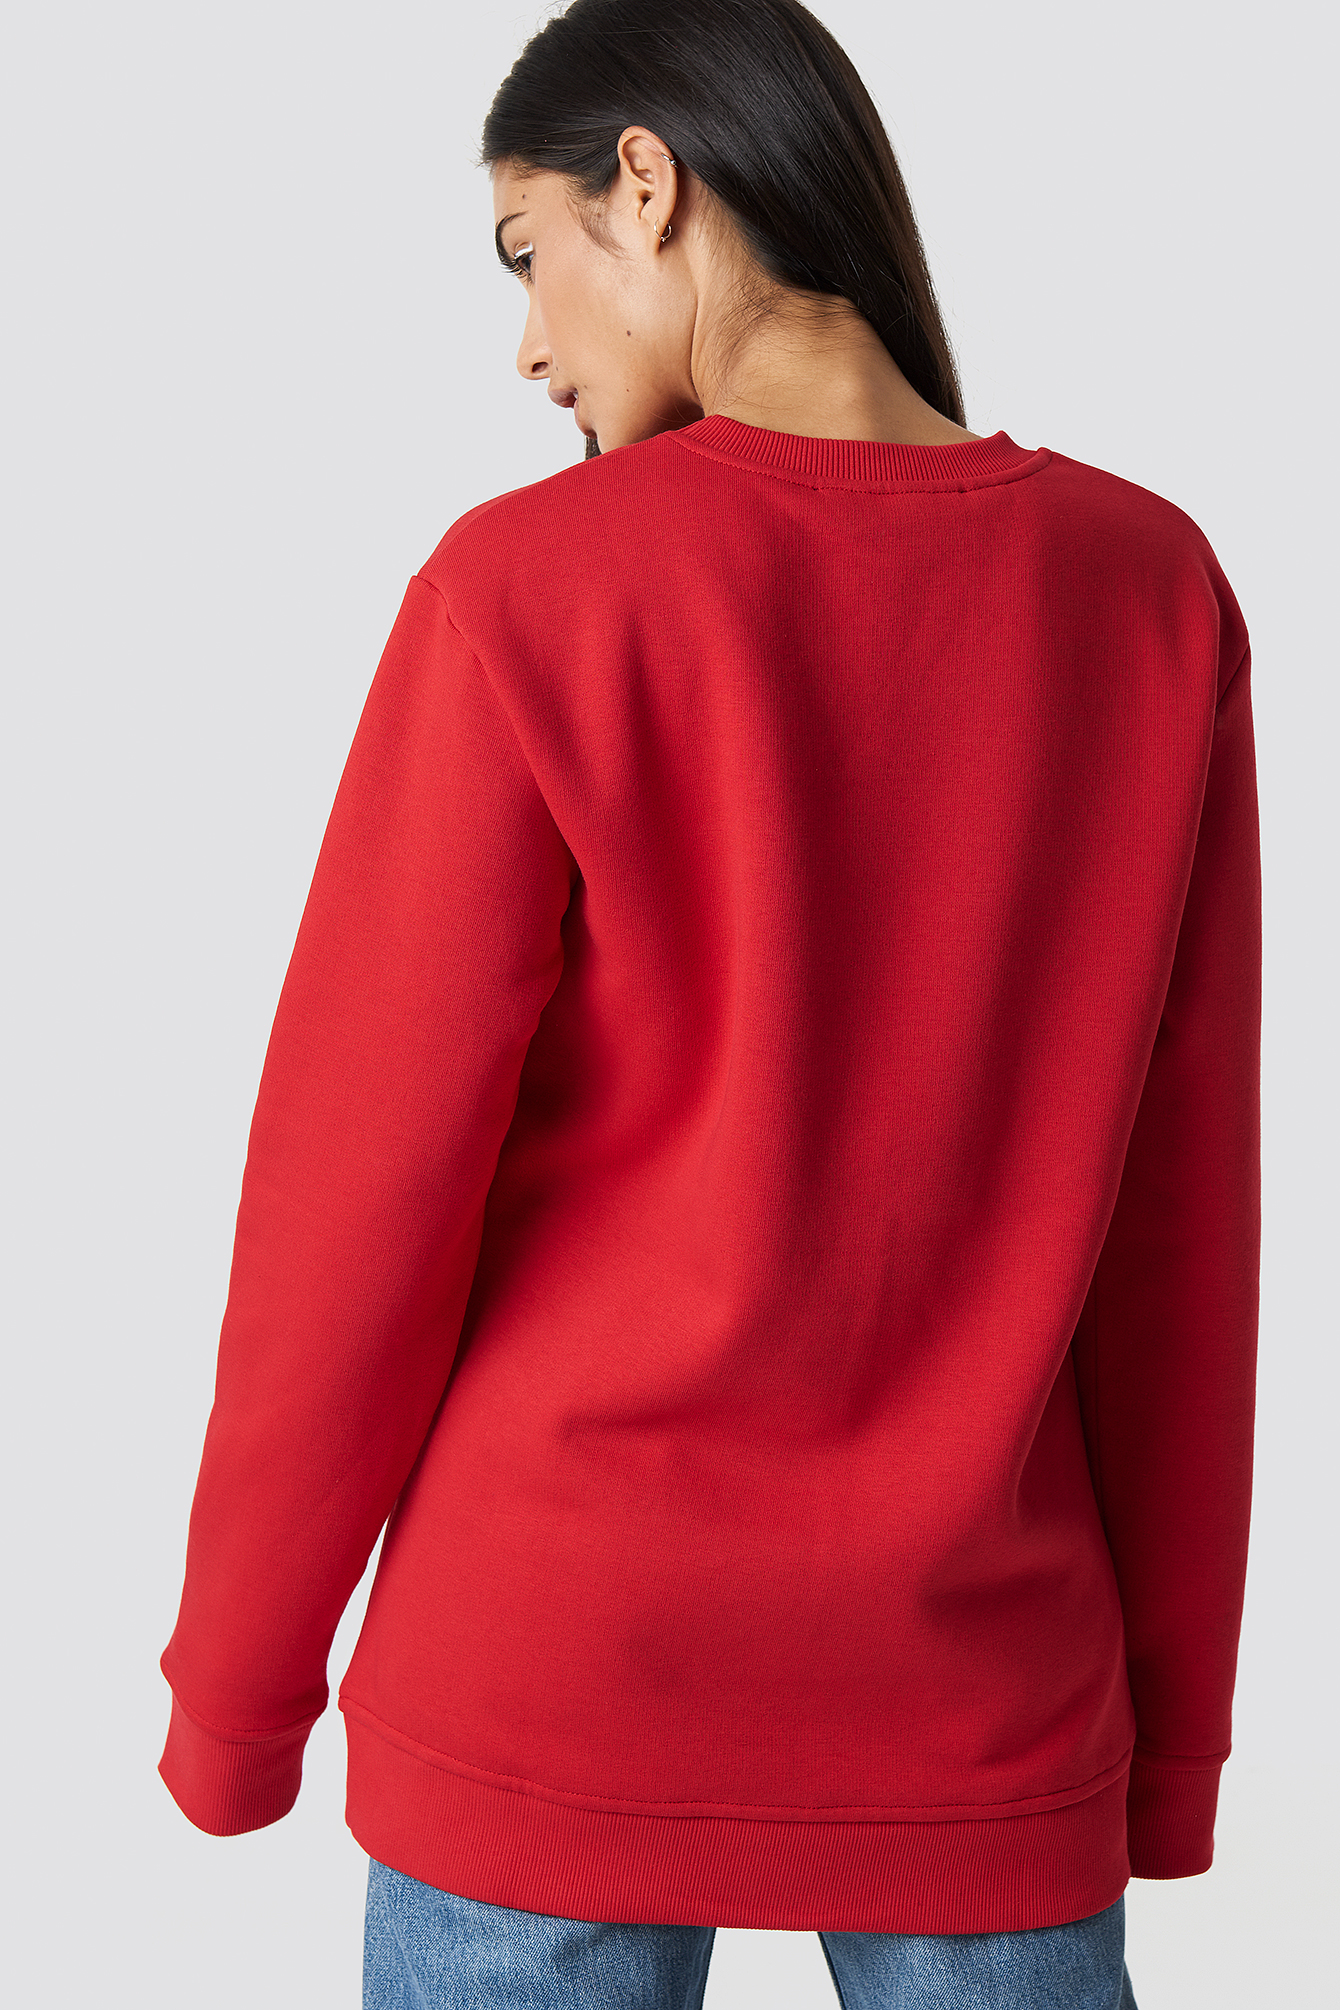 The Classy Logo Unisex Sweater NA-KD.COM